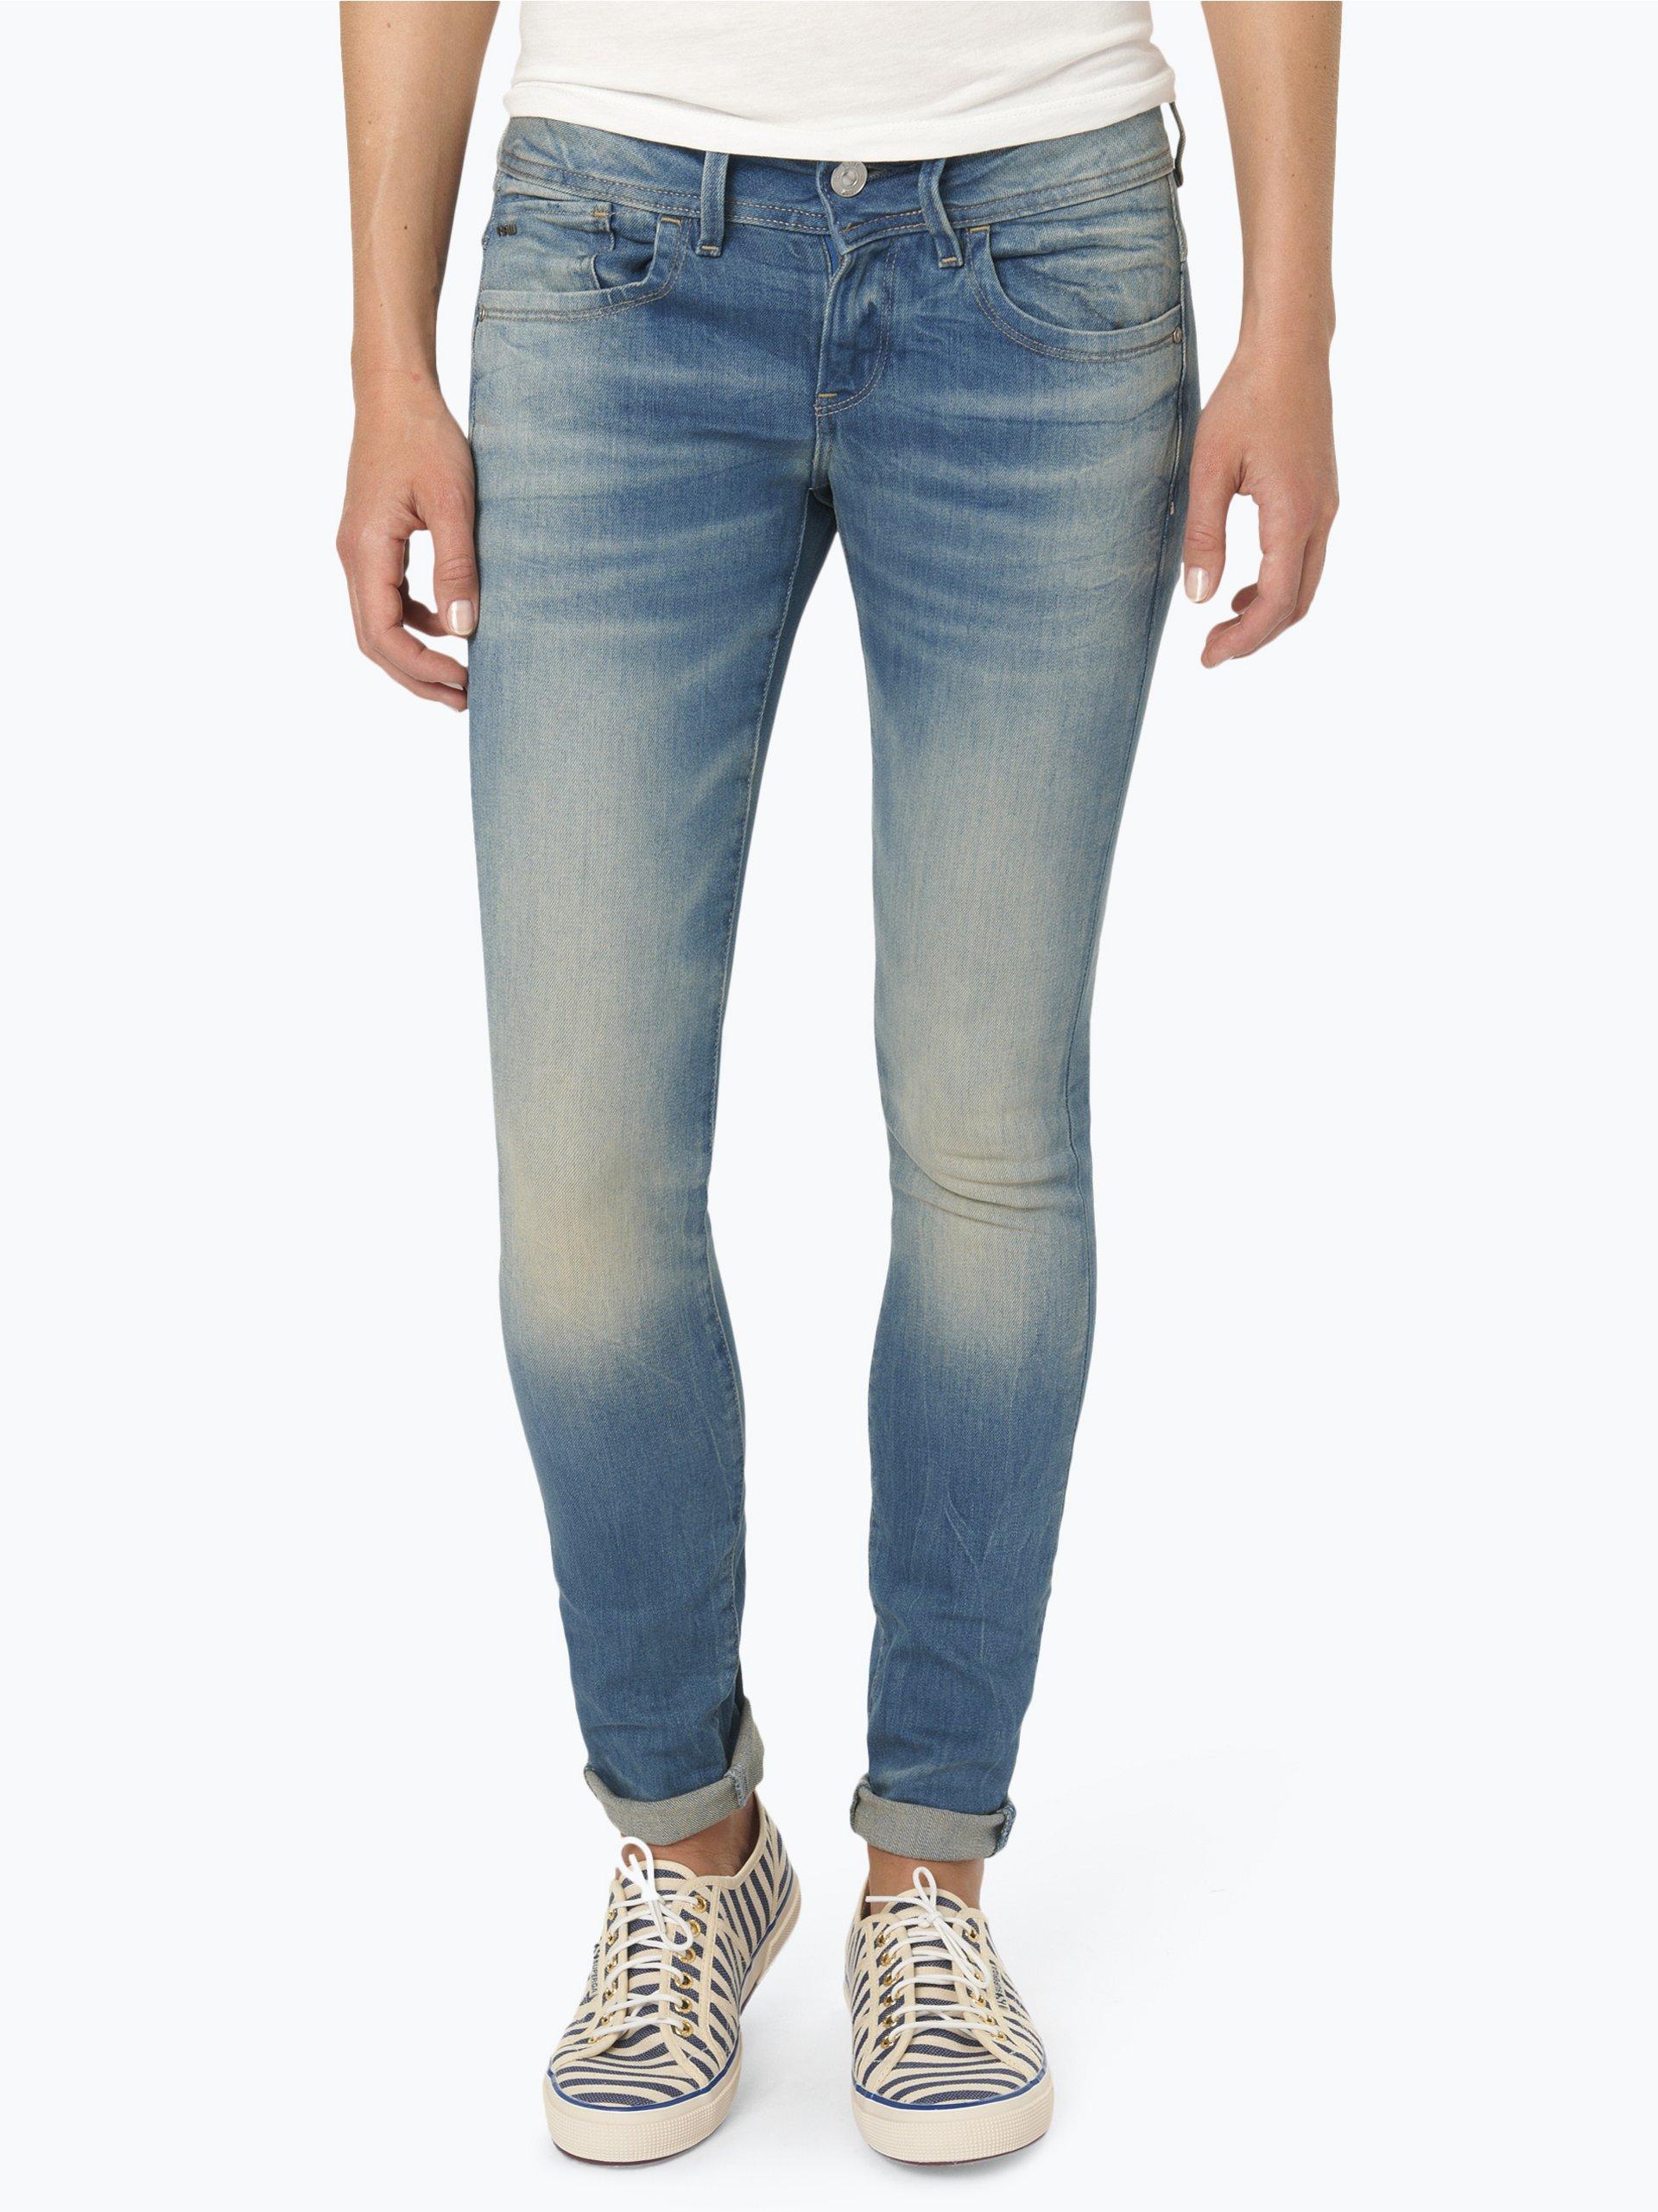 g star damen jeans lynn hellblau blau uni online kaufen. Black Bedroom Furniture Sets. Home Design Ideas